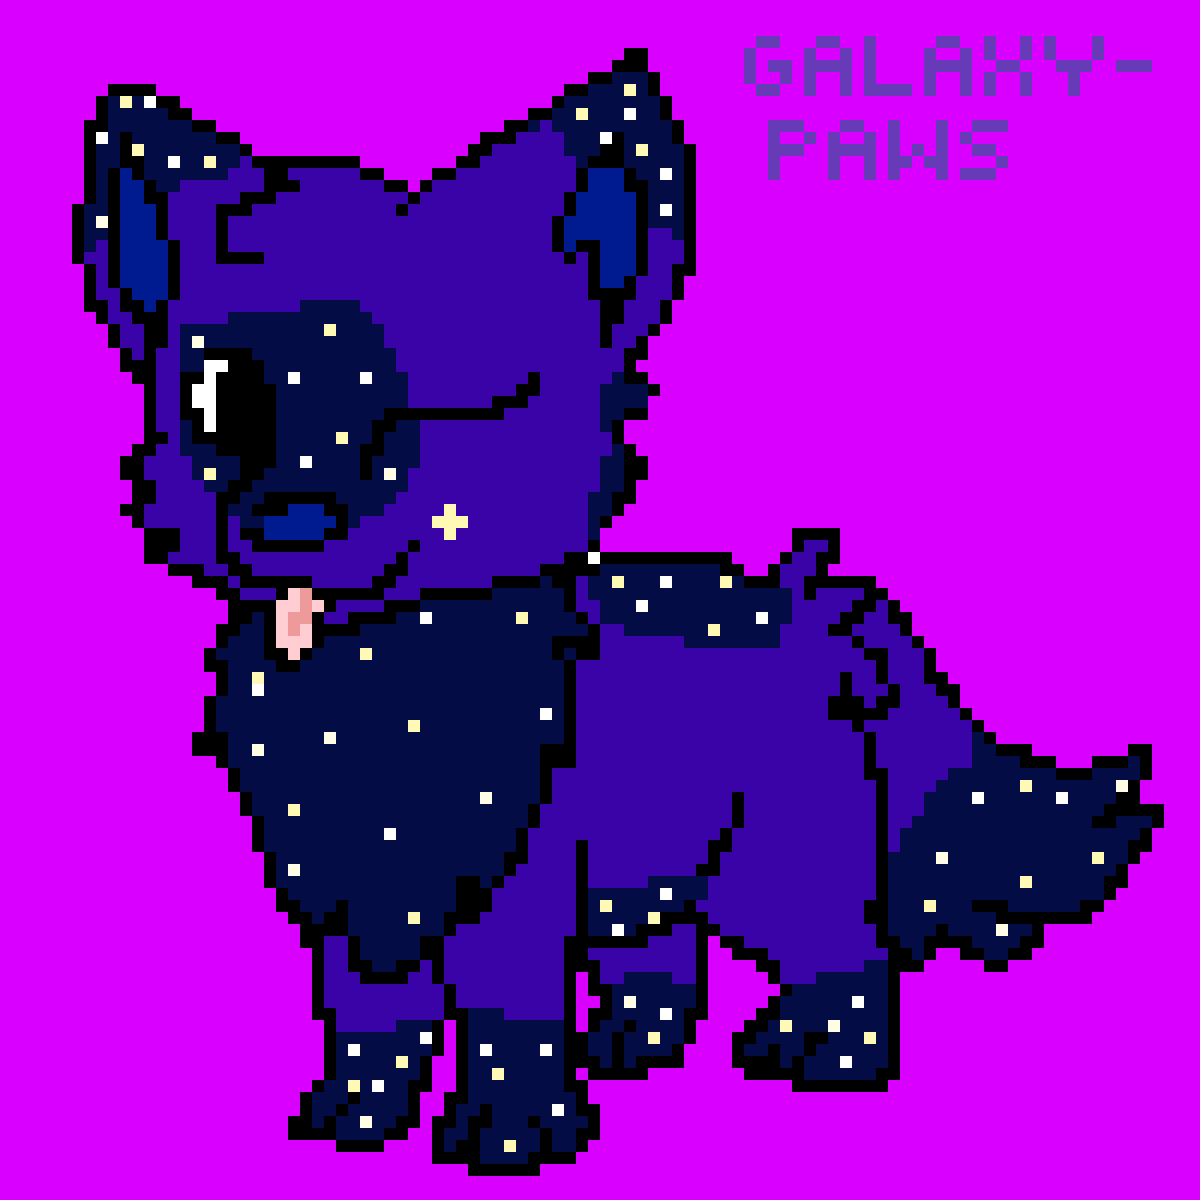 Galaxy-paws